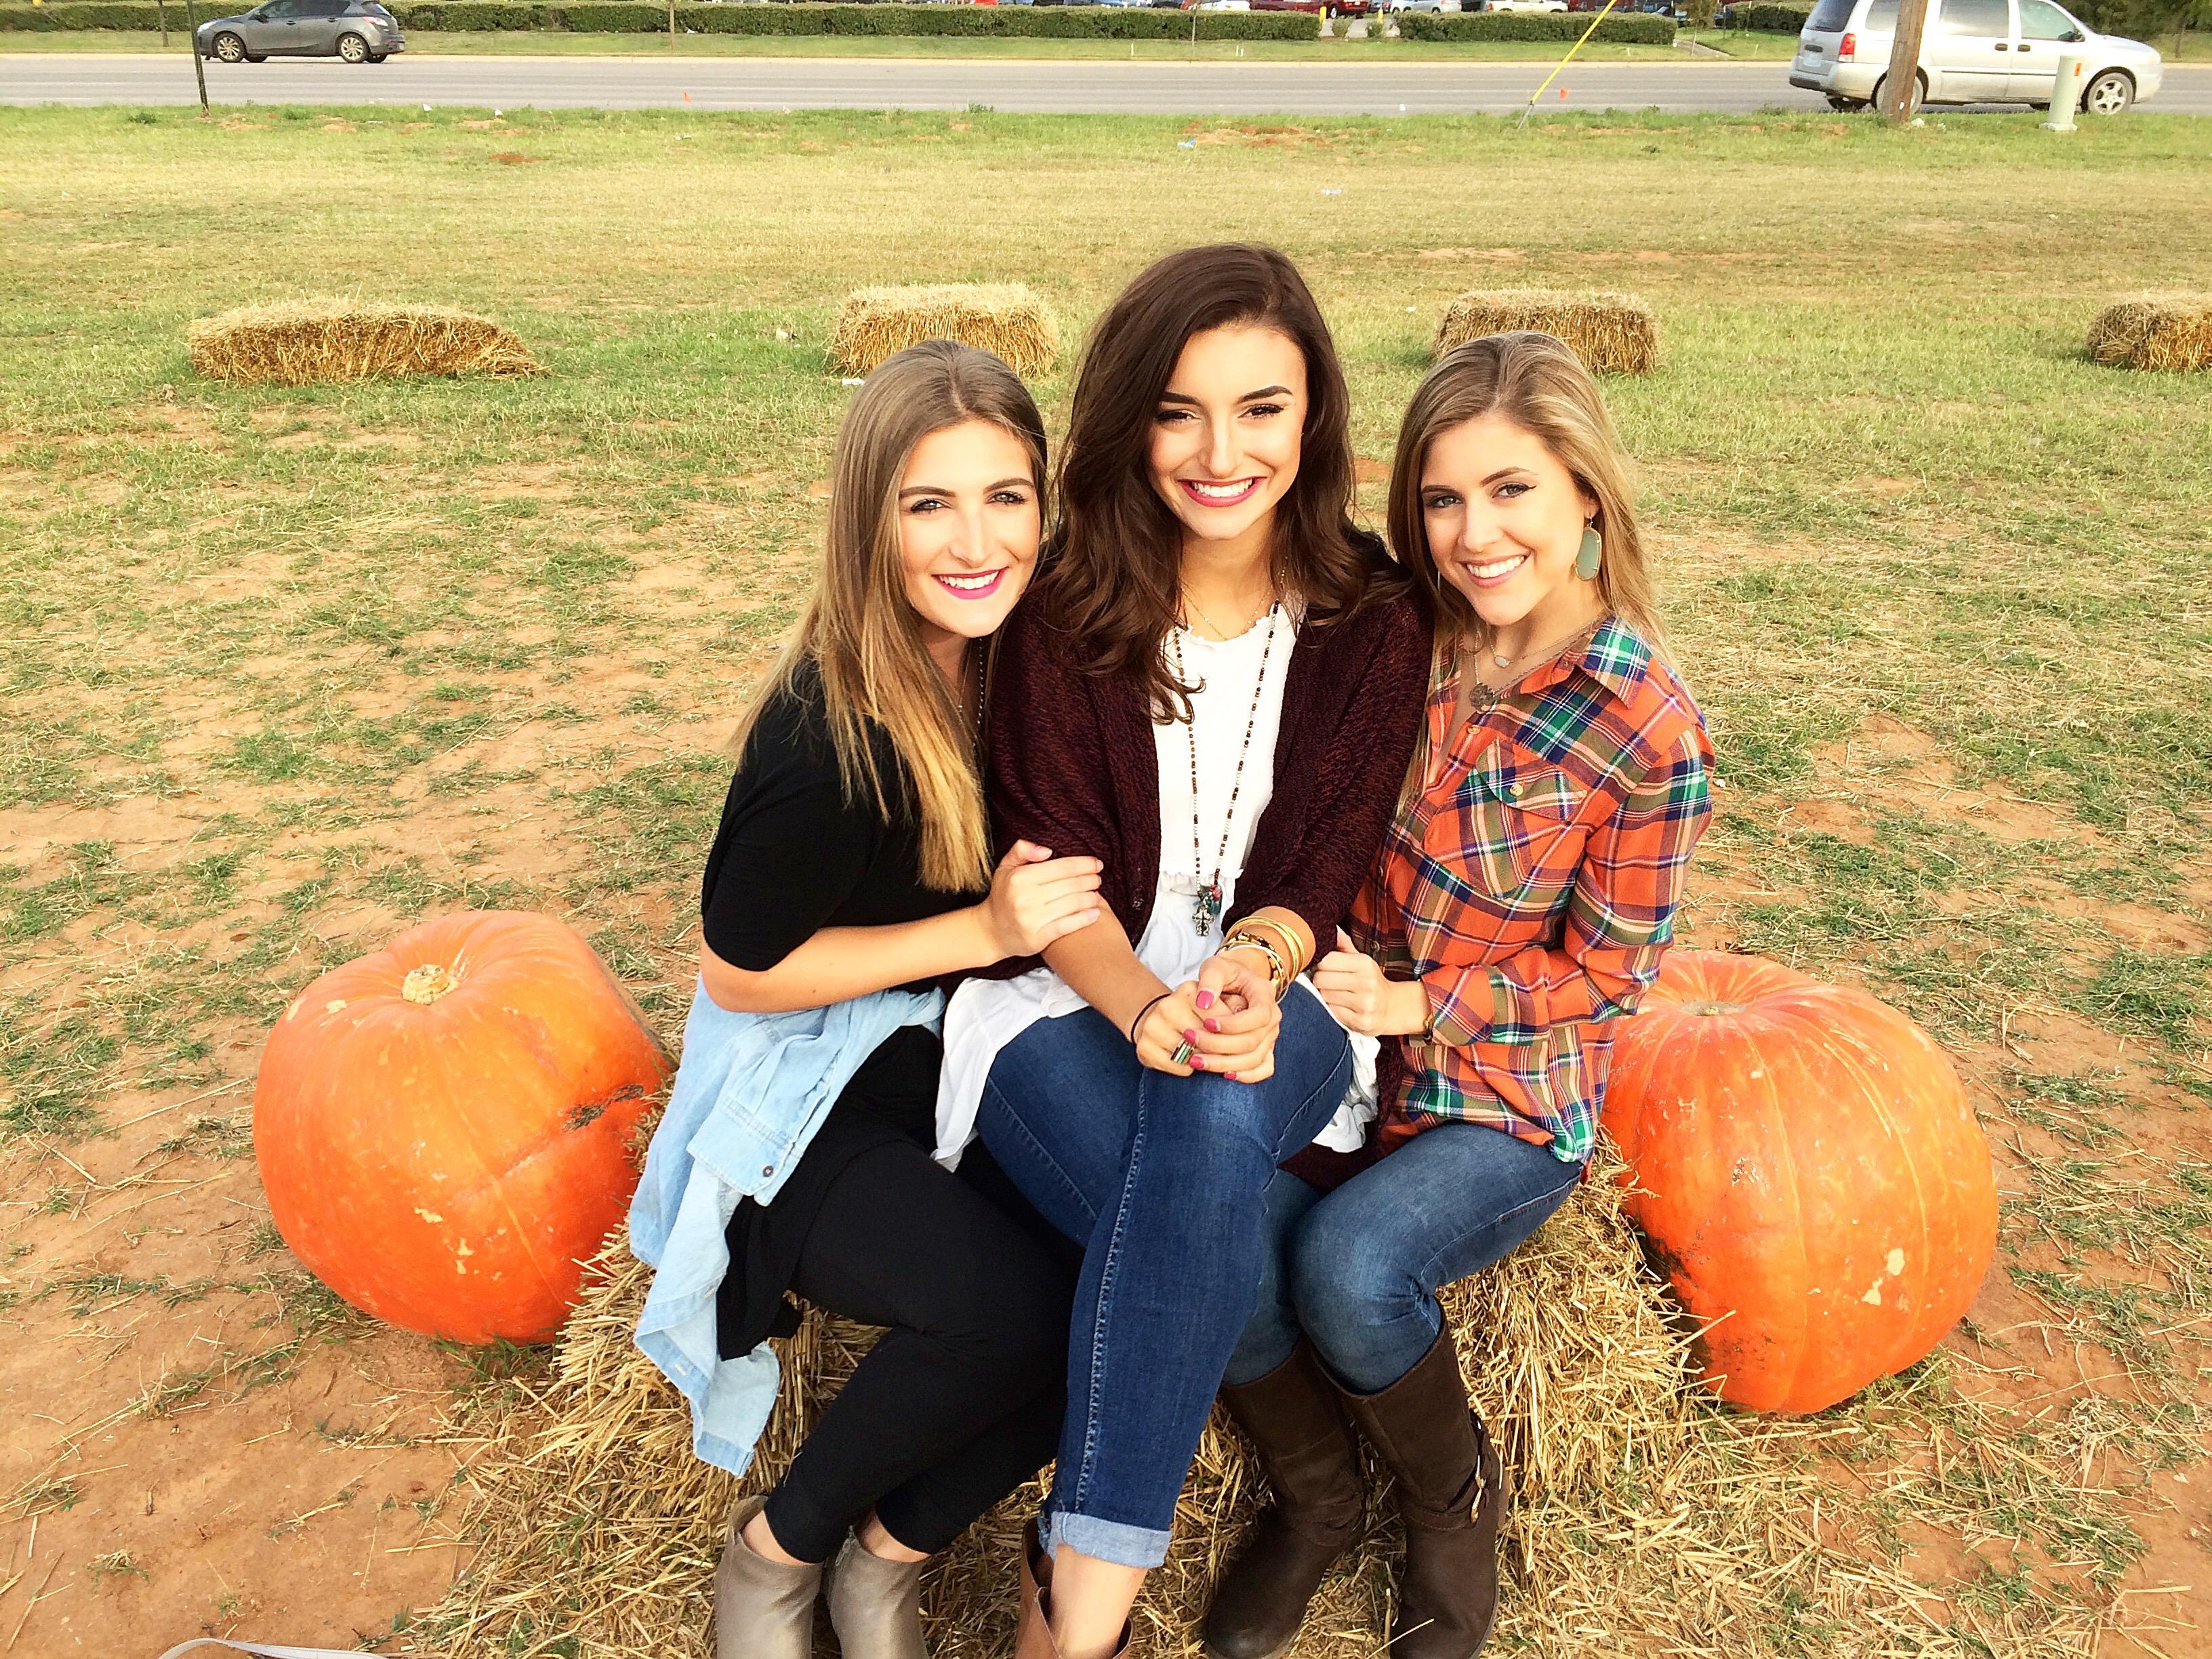 pumpkin patch with sorority friends